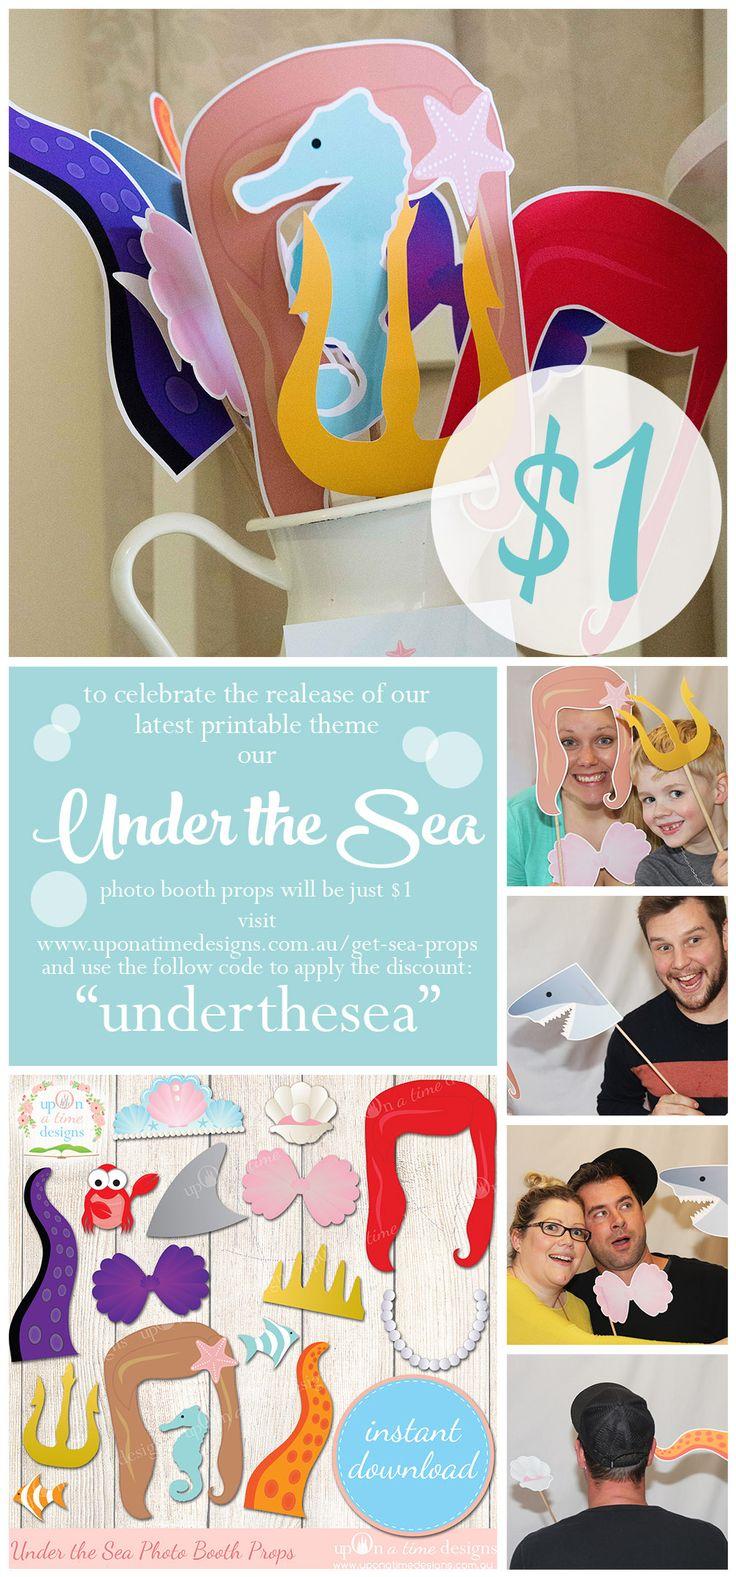 wedding photo booth props printable%0A    printable Under the Sea Mermaid Photo Booth Props  Mermaid party ideas